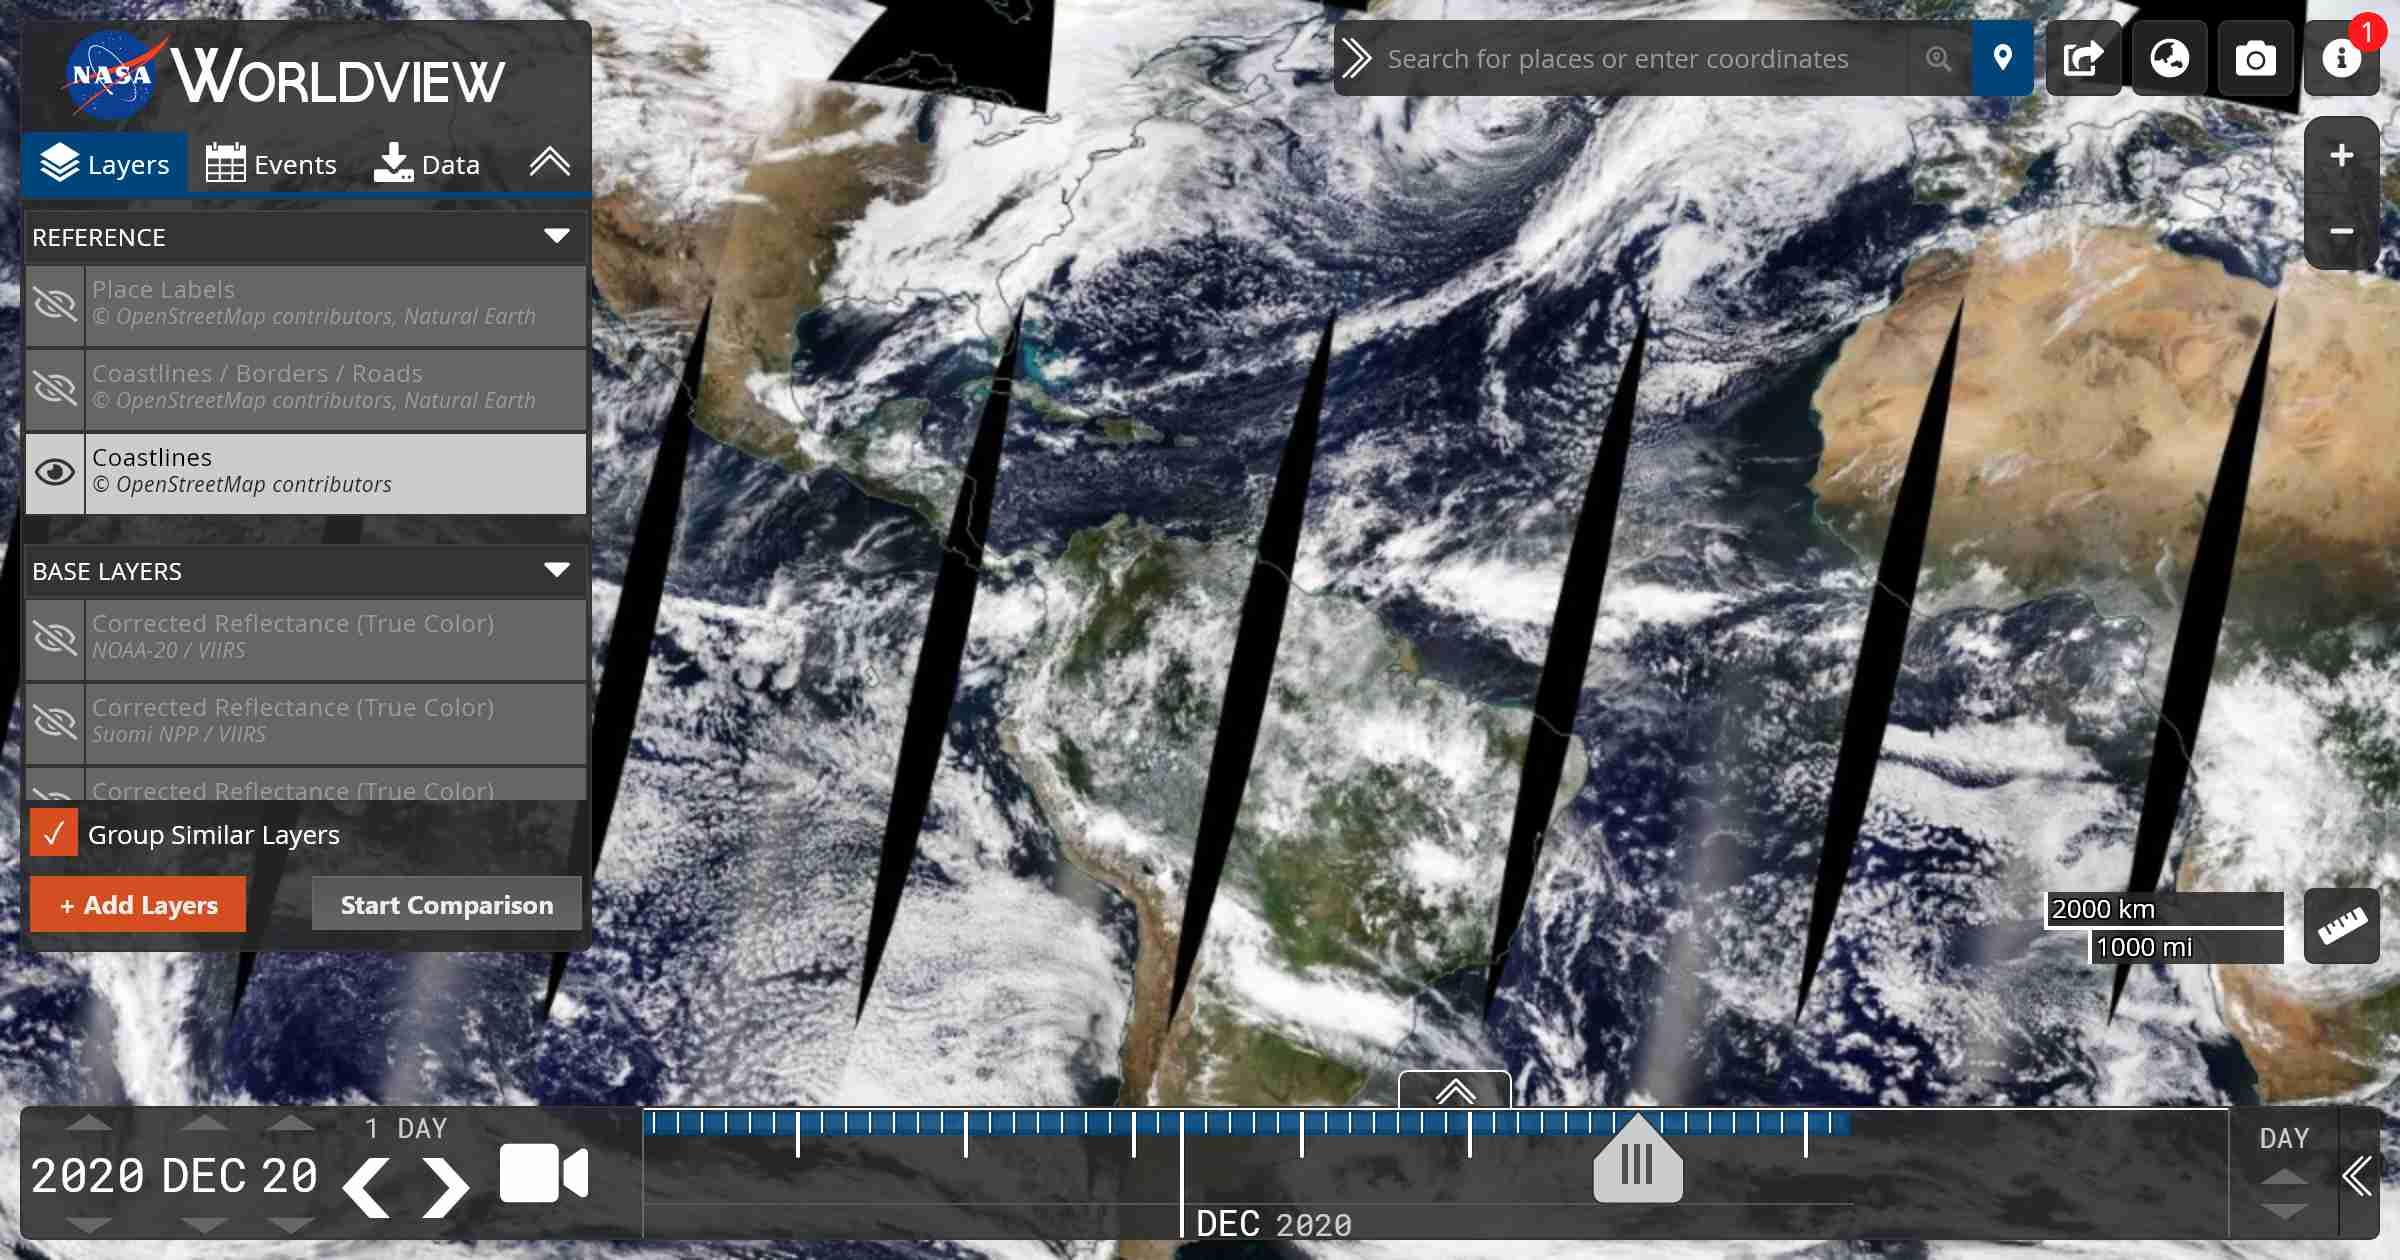 worldview.earthdata.nasa.gov